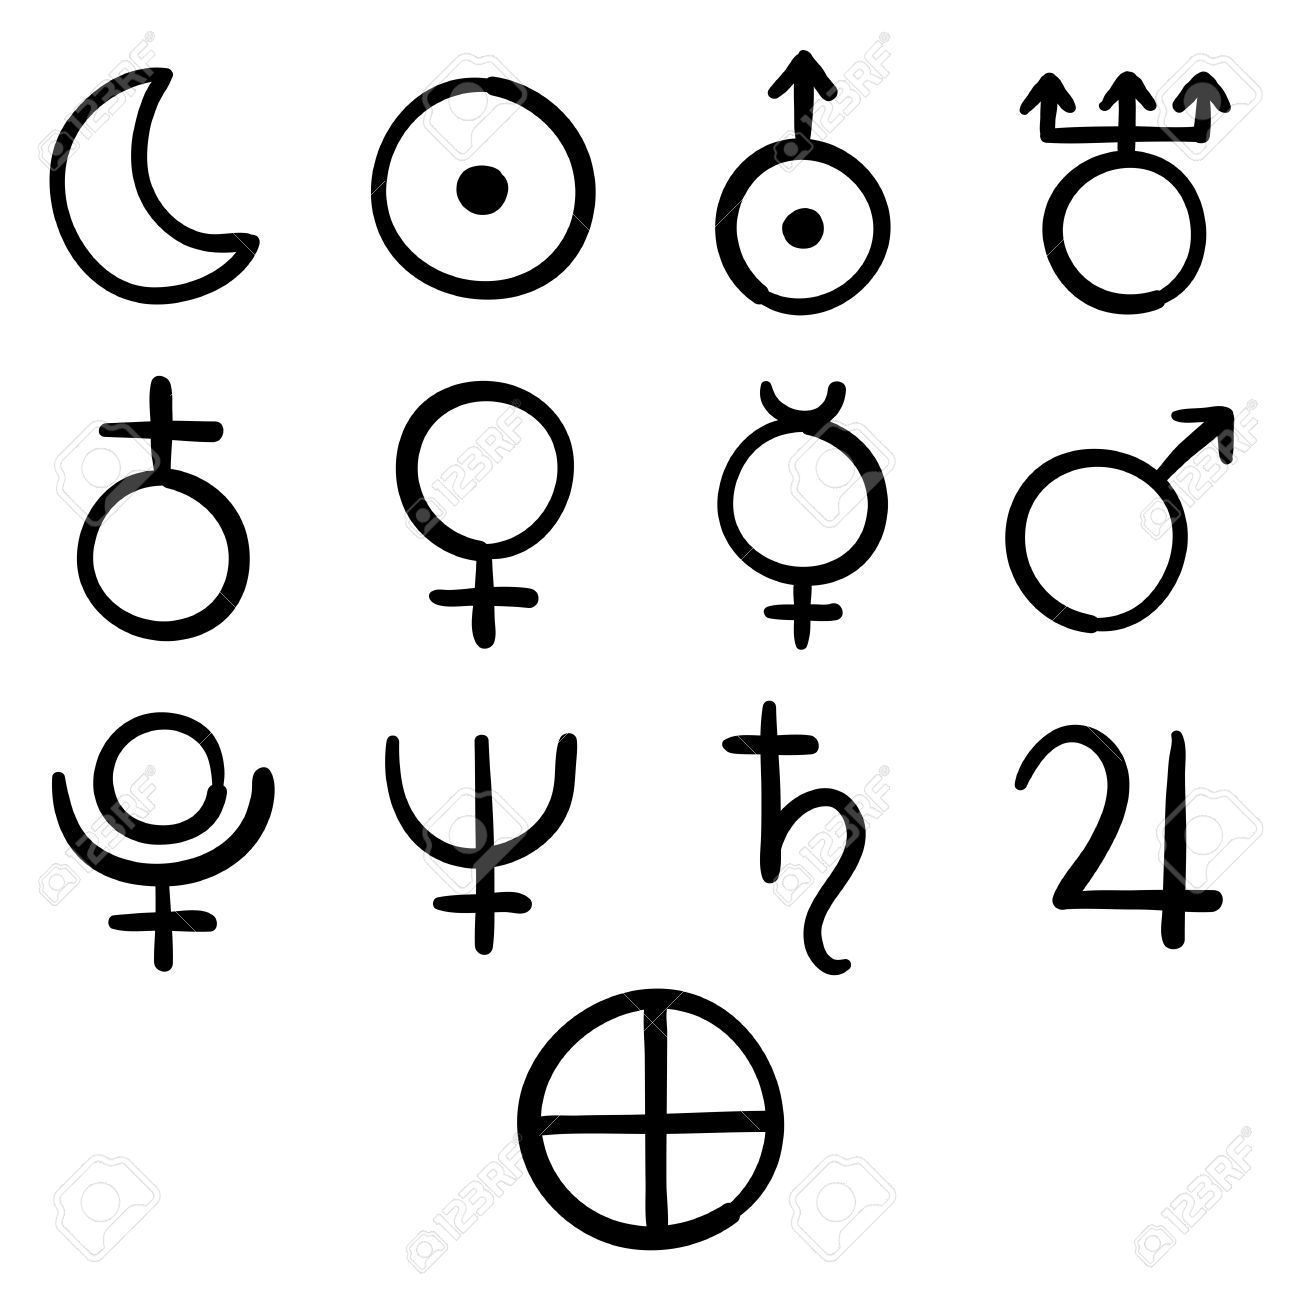 Solar system symbol cerca con google tattoos pinterest tattoo solar system symbol cerca con google buycottarizona